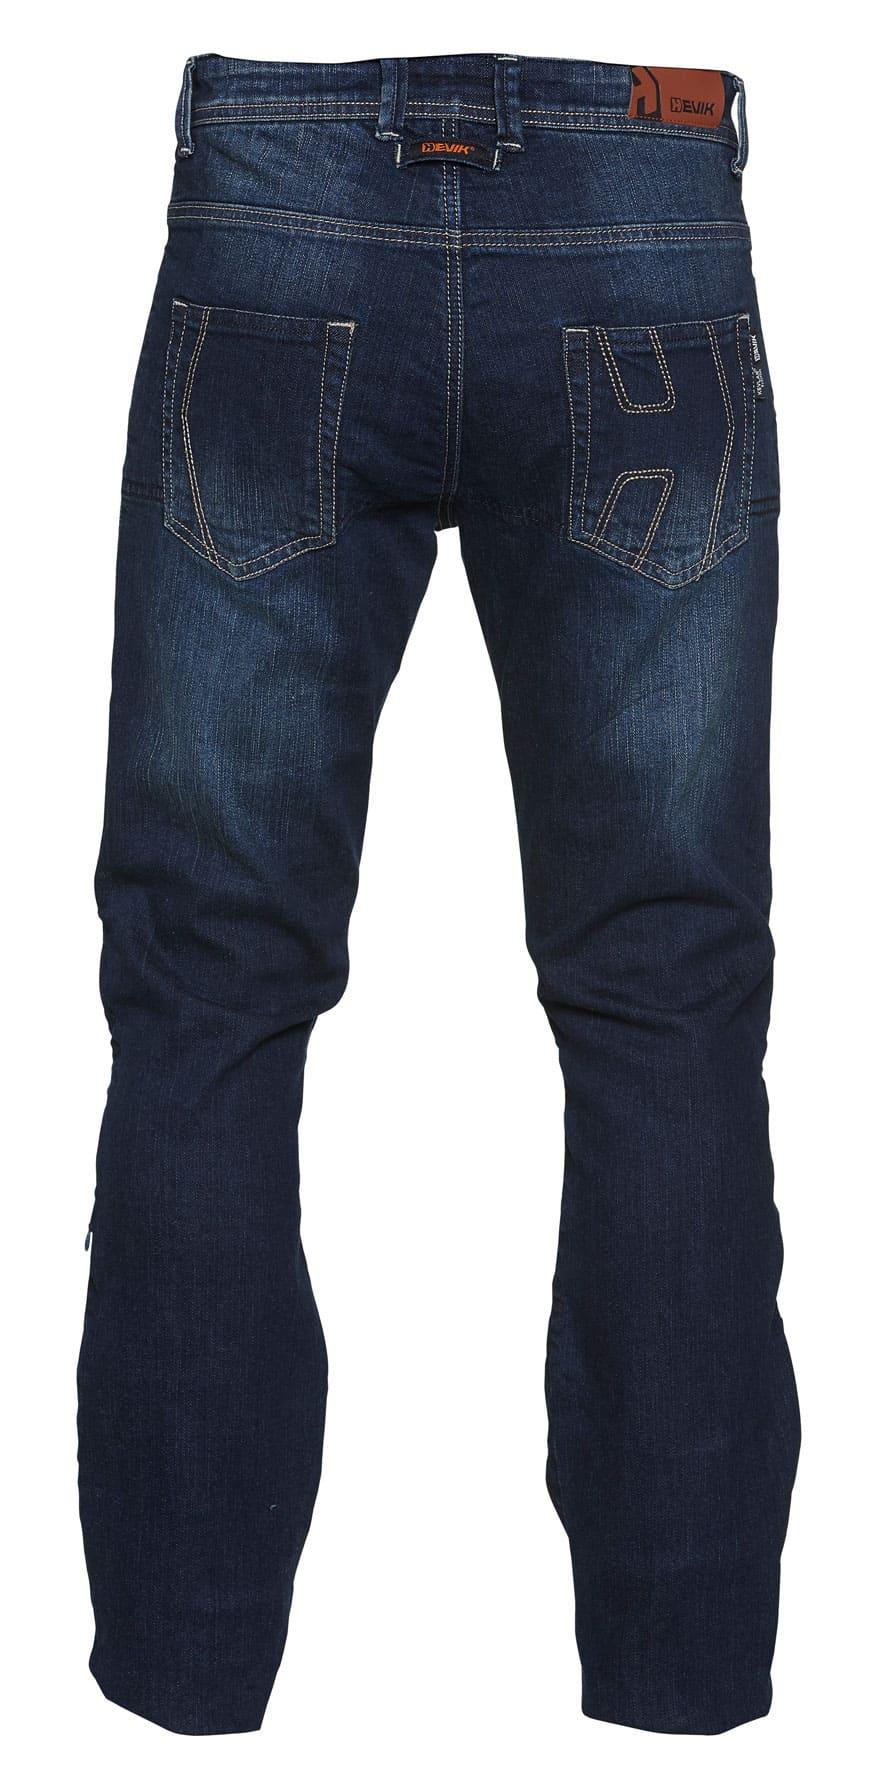 HEVIK jeans Street (back)